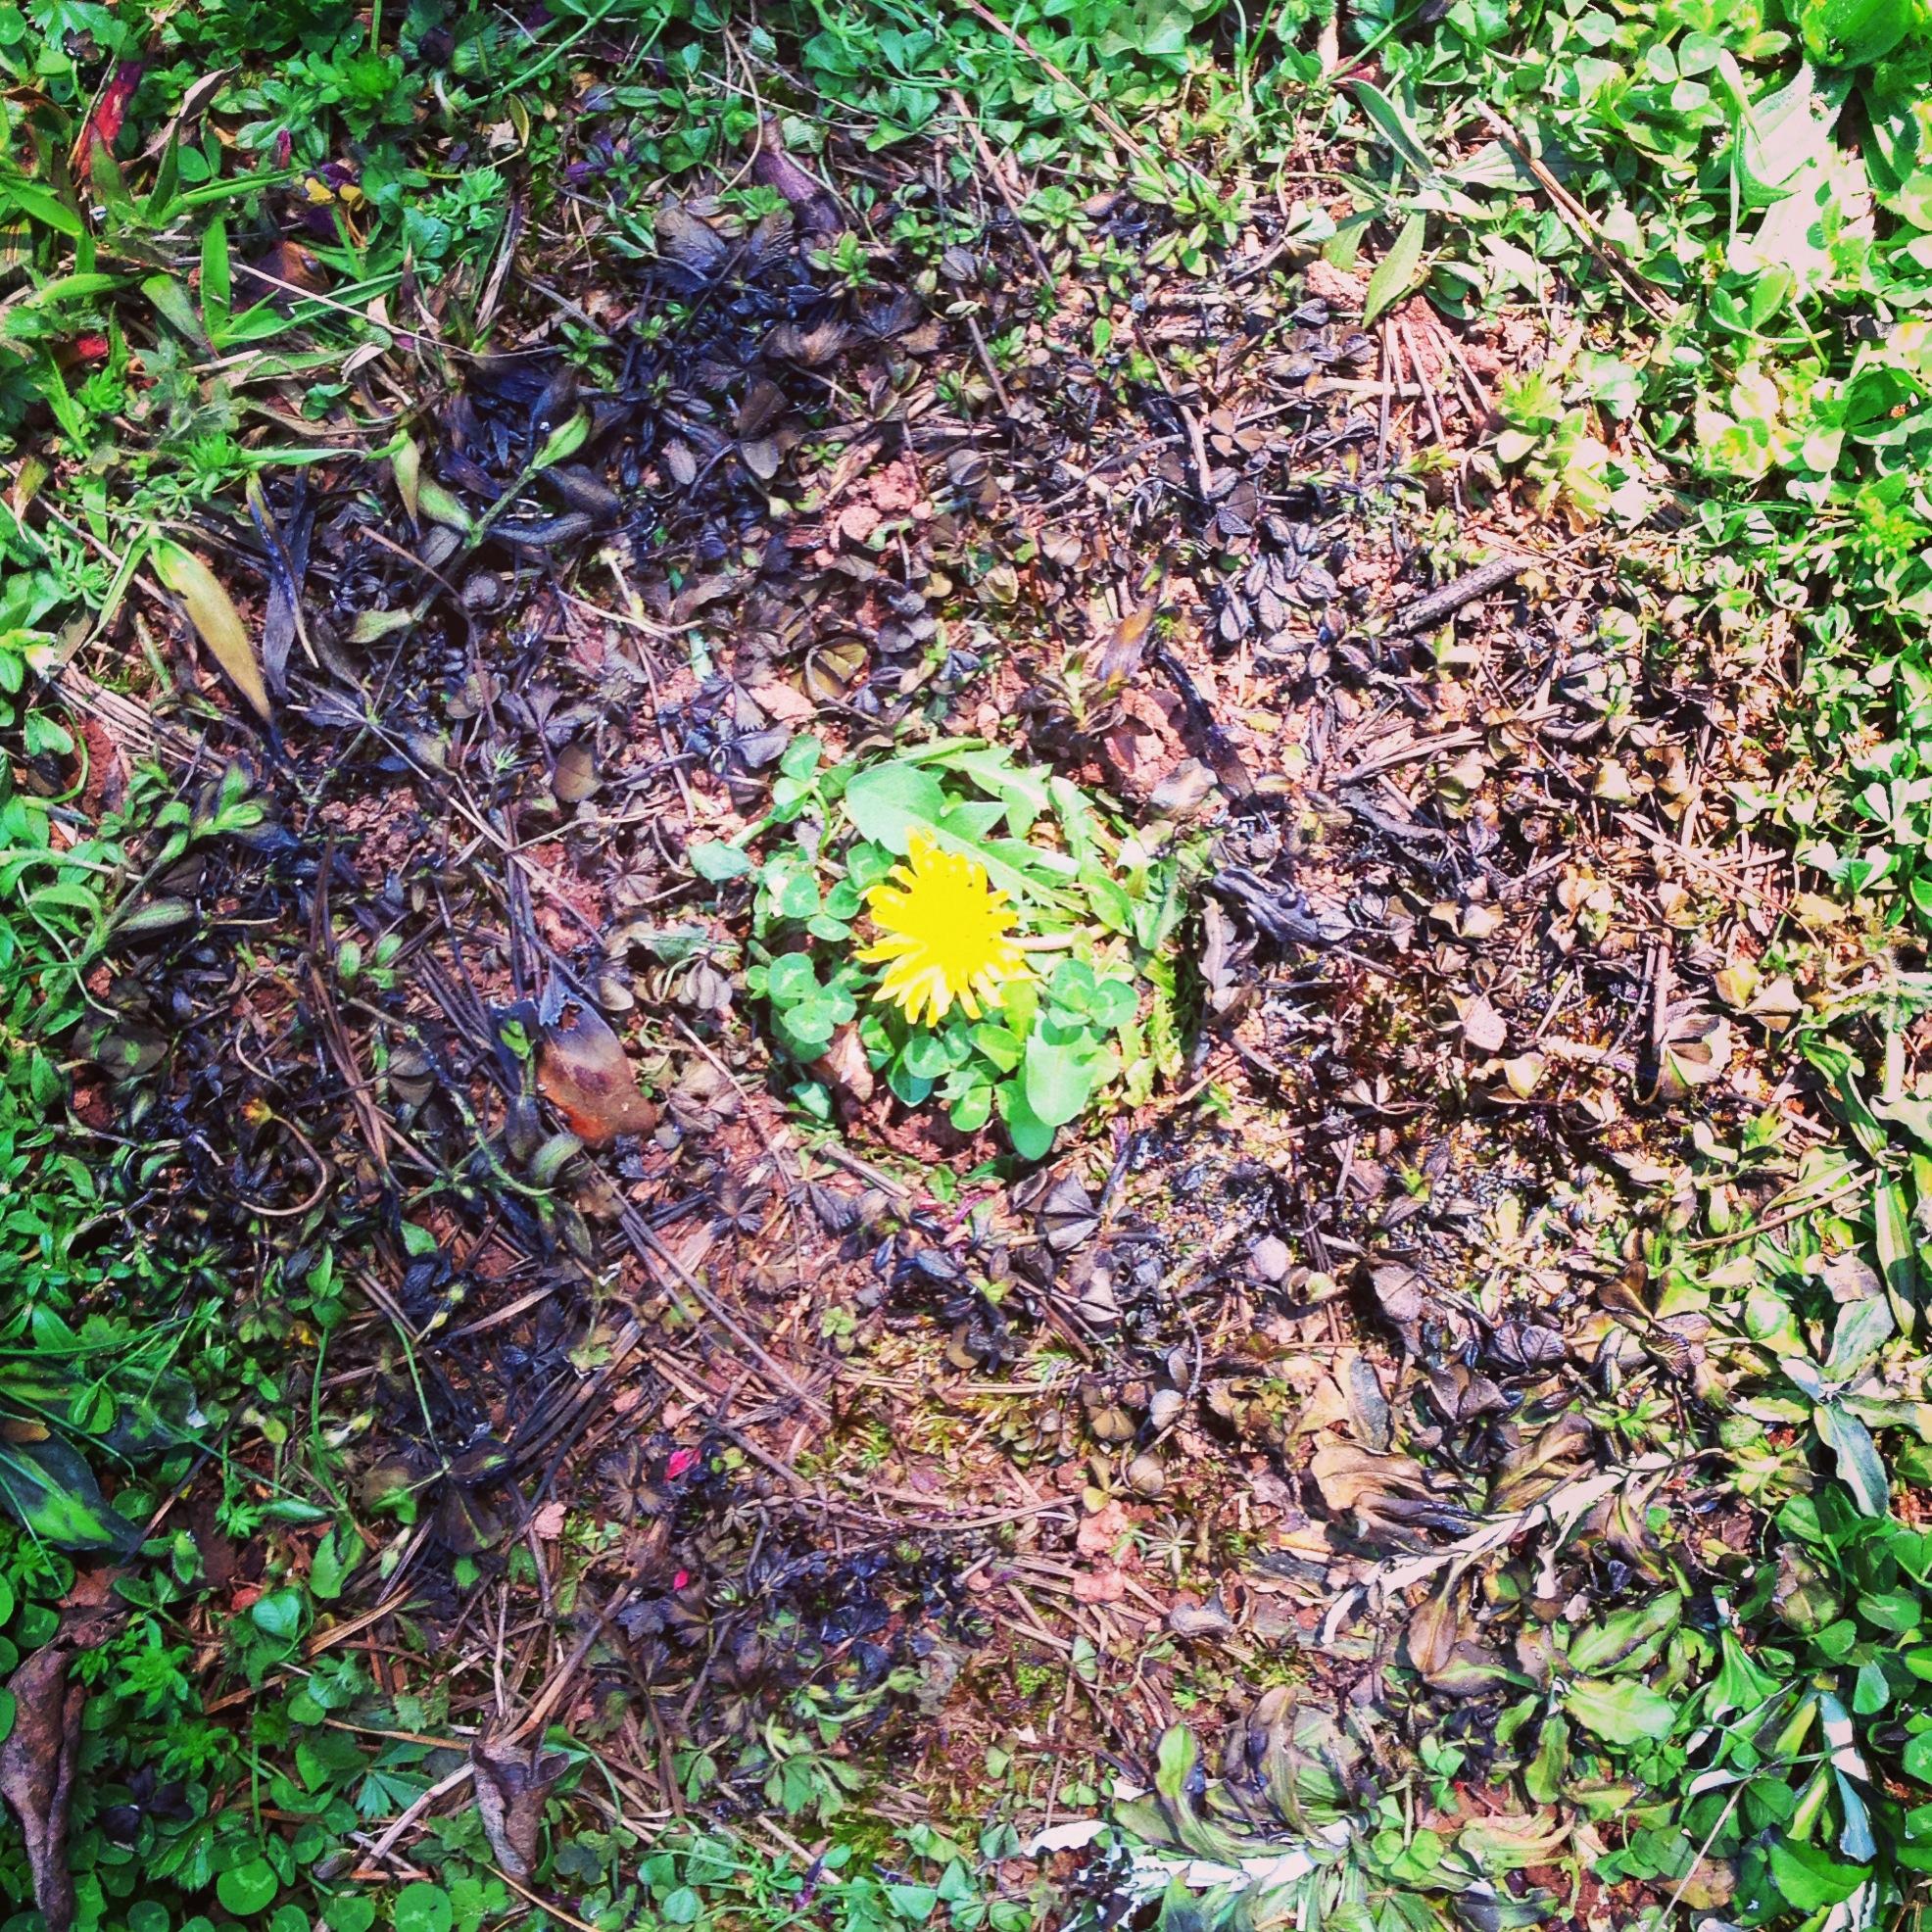 Dandelion inside burnt grass. Athens, GA. Summer 2013